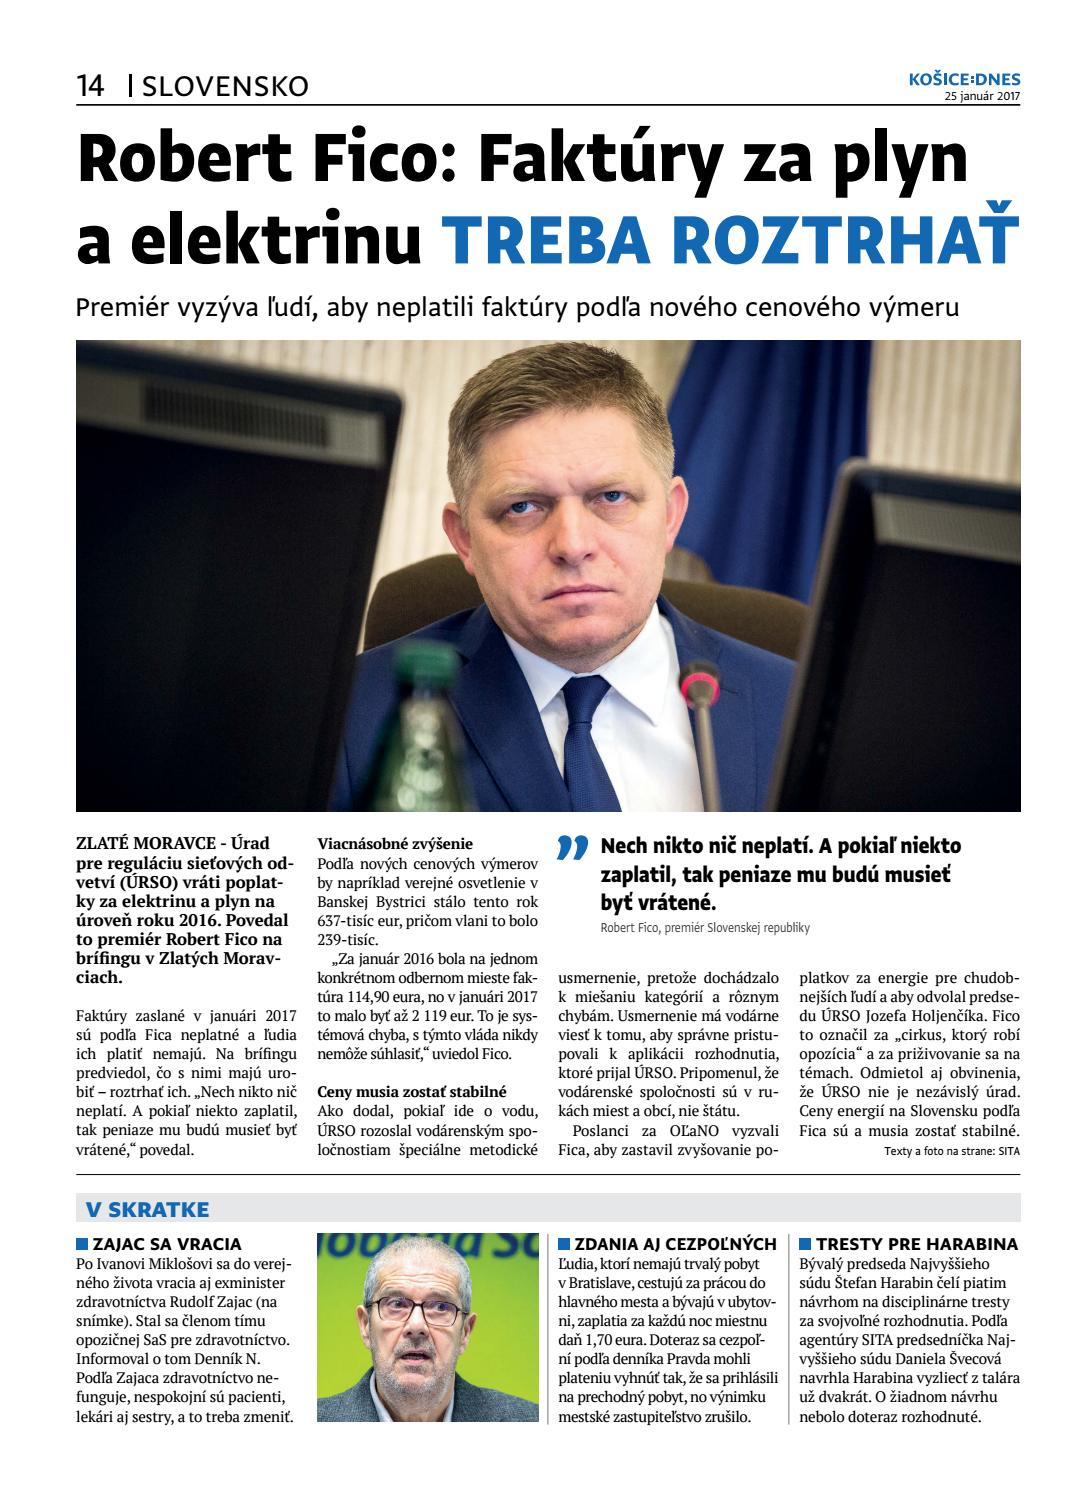 42375f1bc4e5 KOŠICE DNES 25.1.2017 by KOŠICE DNES - issuu